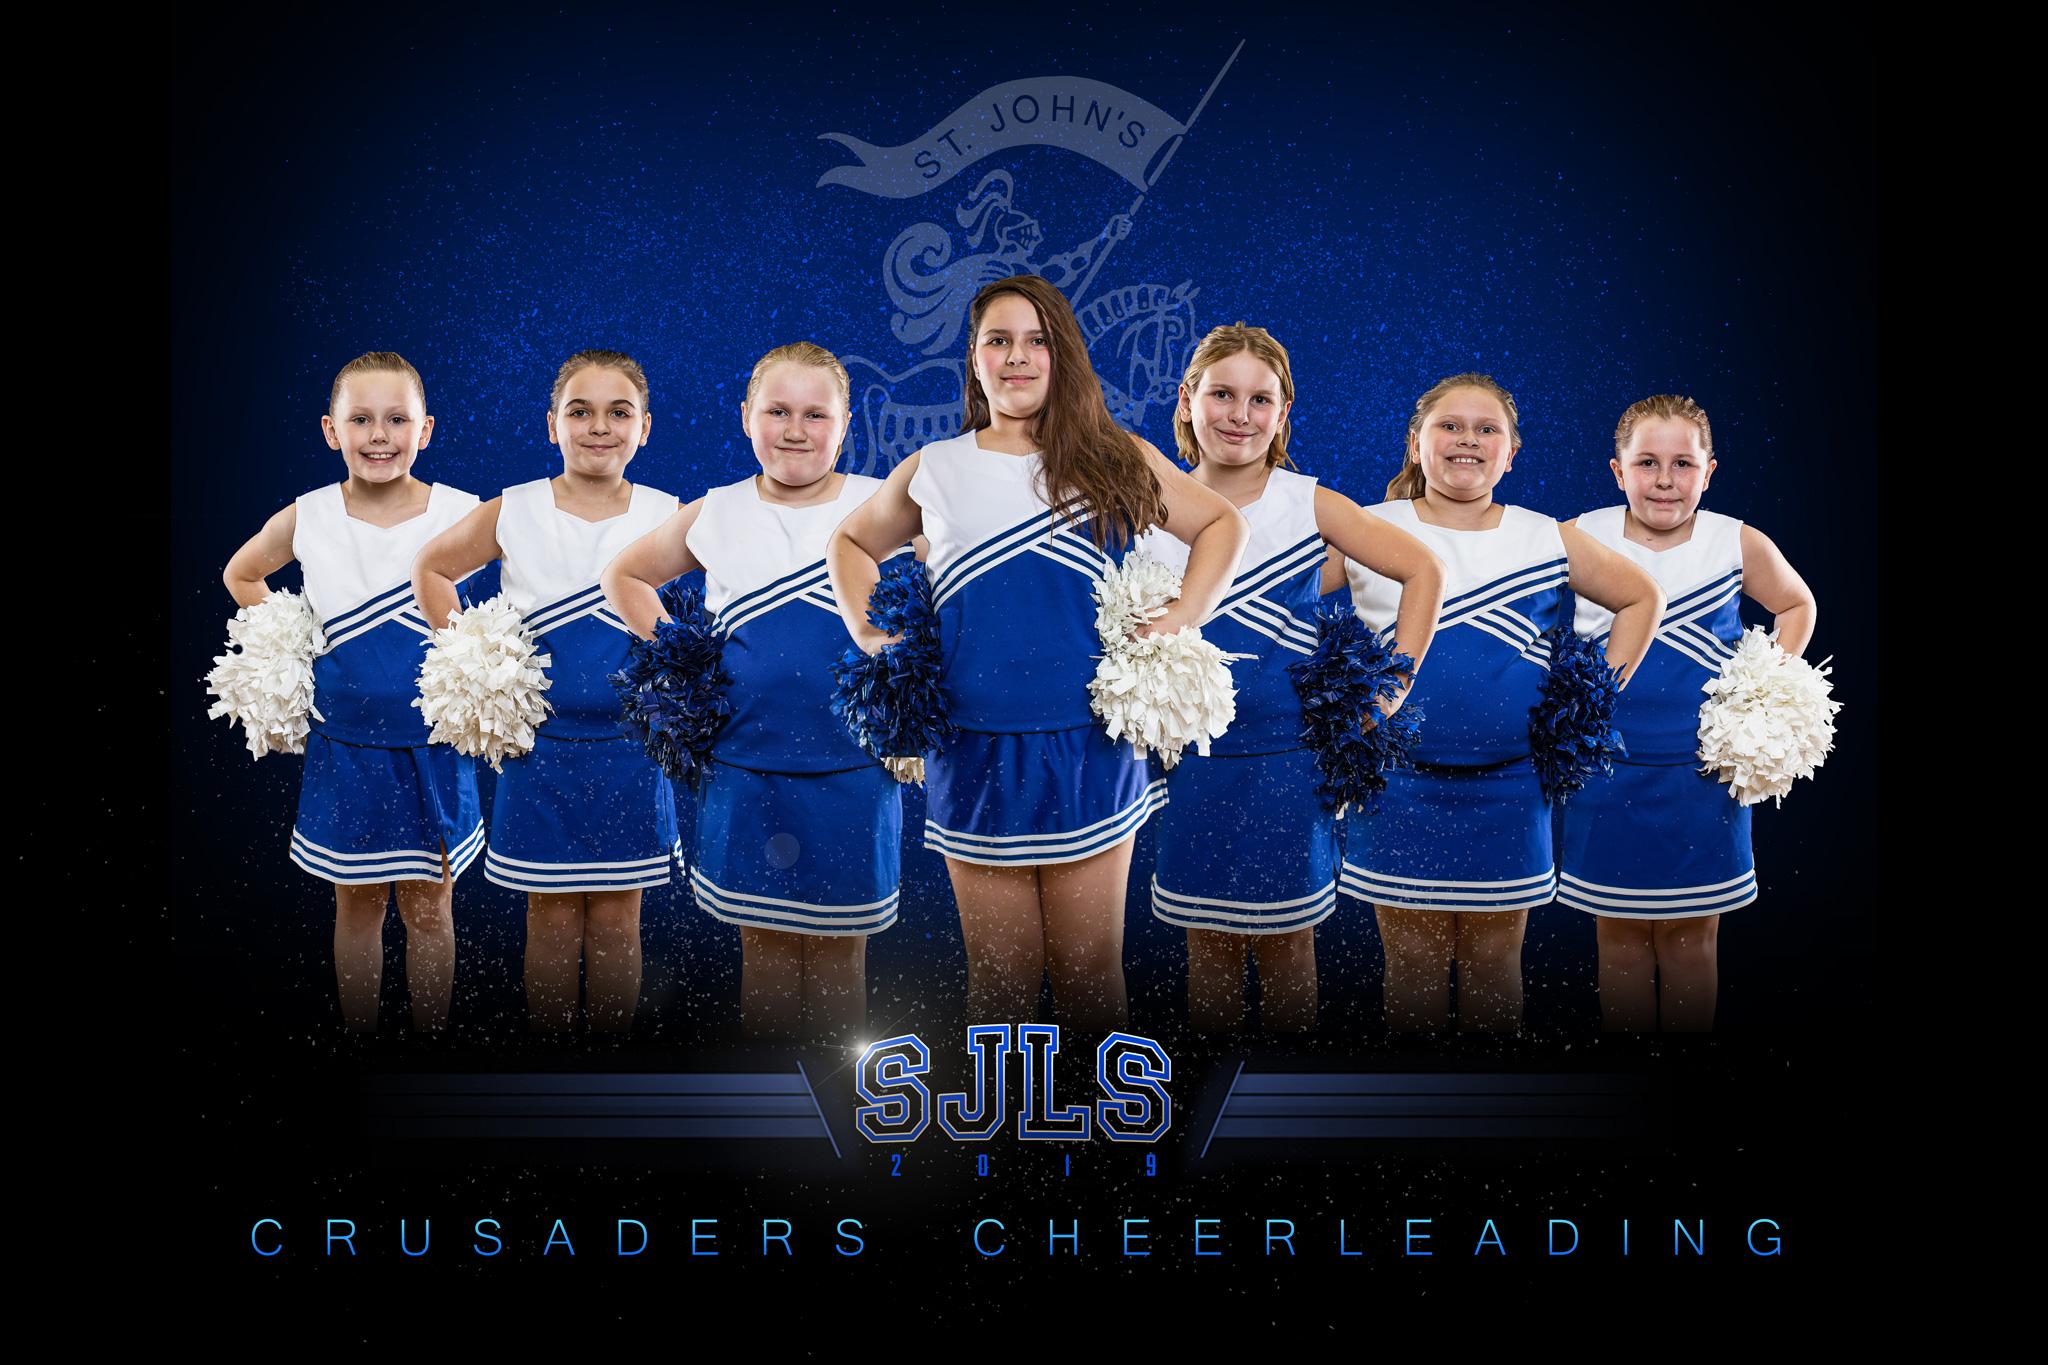 Cheer Team photo pose